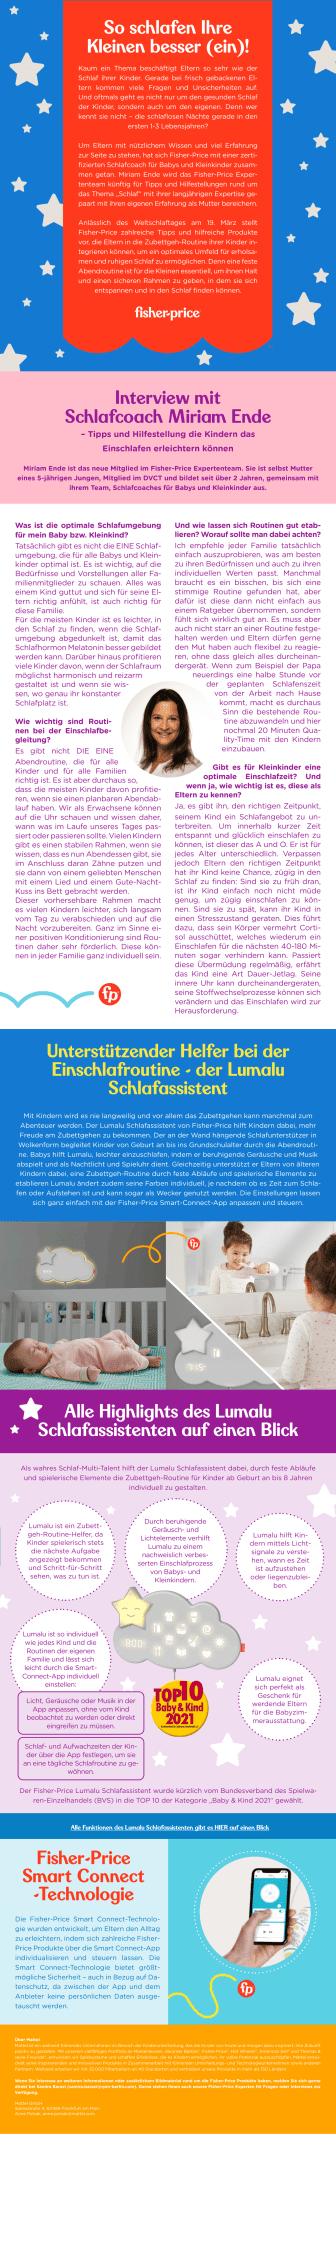 210318_FP_Mailing.pdf